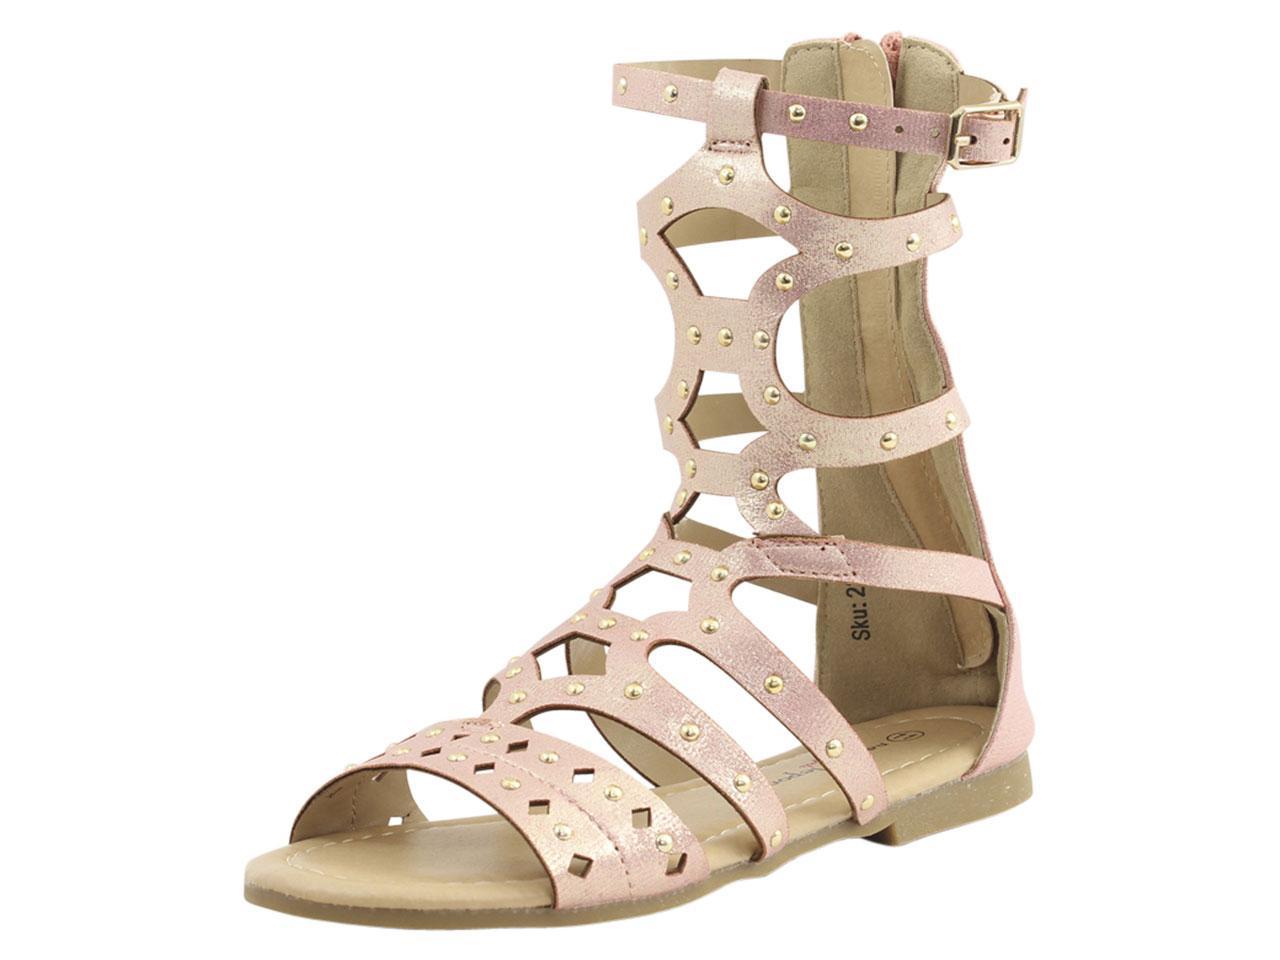 Image of Nanette Lepore Little/Big Girl's Studded Gladiator Sandals Shoes - Pink Metallic - 1 M US Little Kid